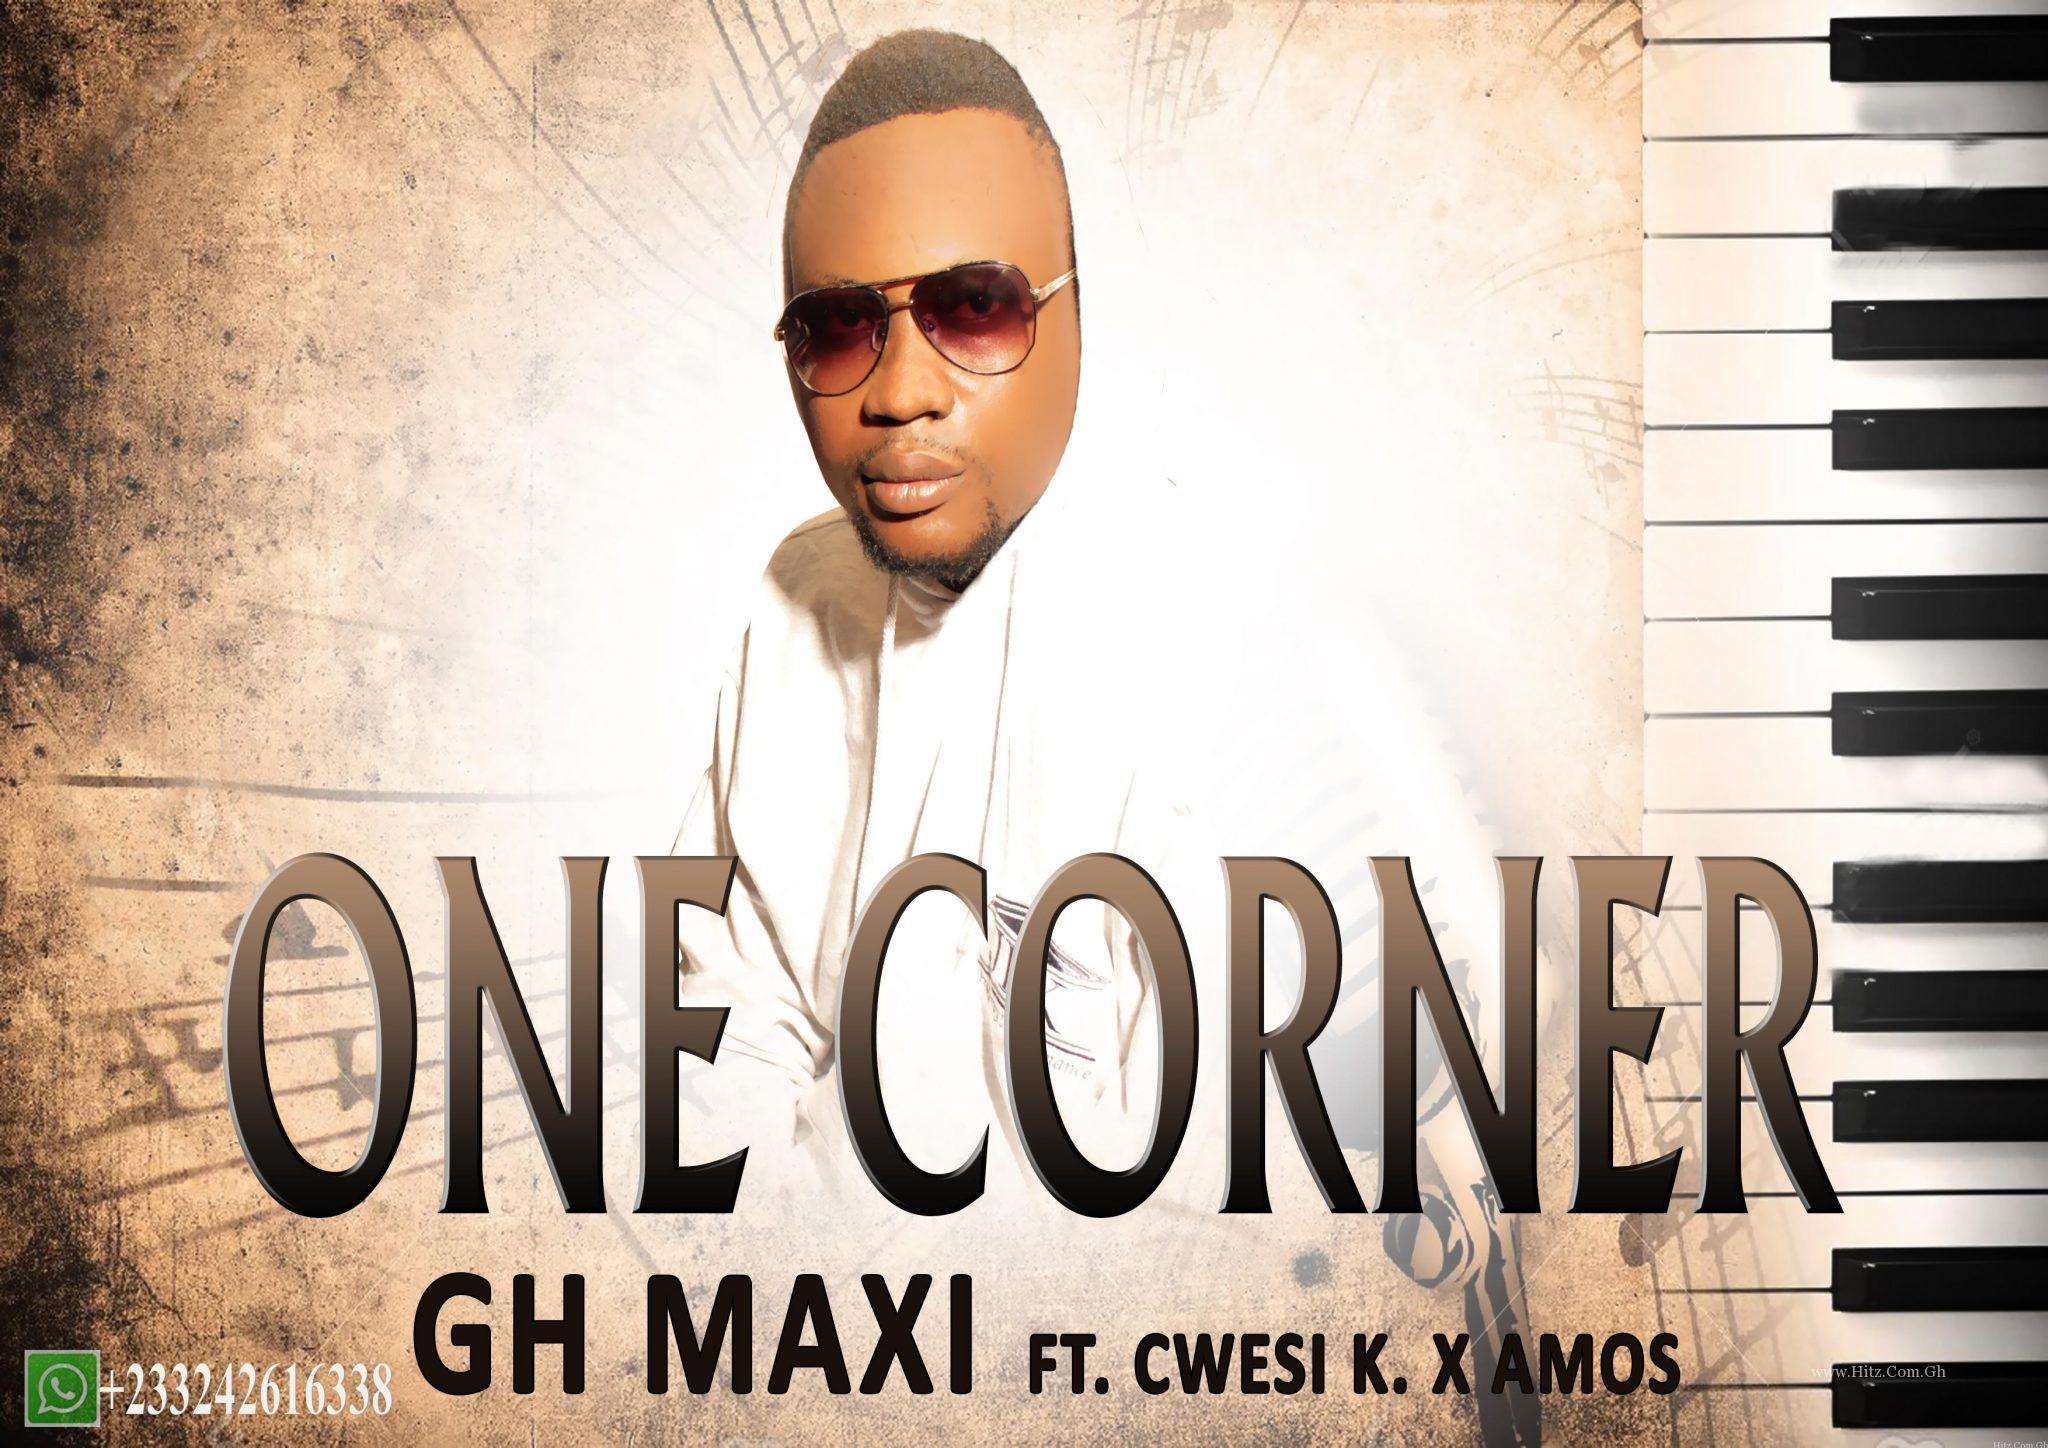 Gh Maxi - One Corner Ft. Cwesi K x Amos (Prod by Gh Maxi)